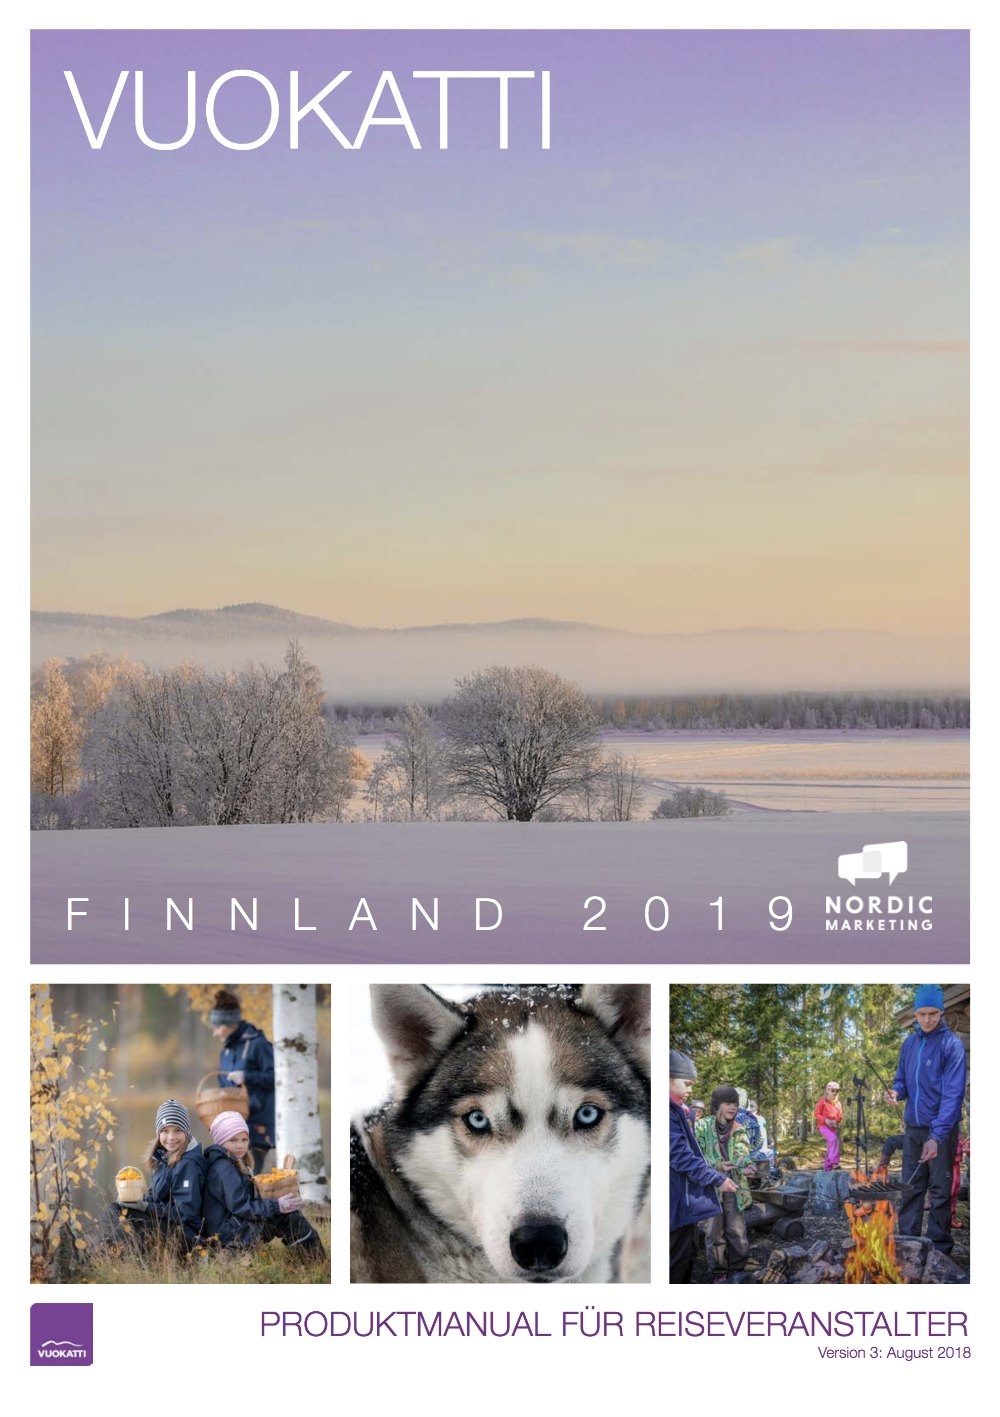 Produktmanual Vuokatti - Finnland 2019.jpg